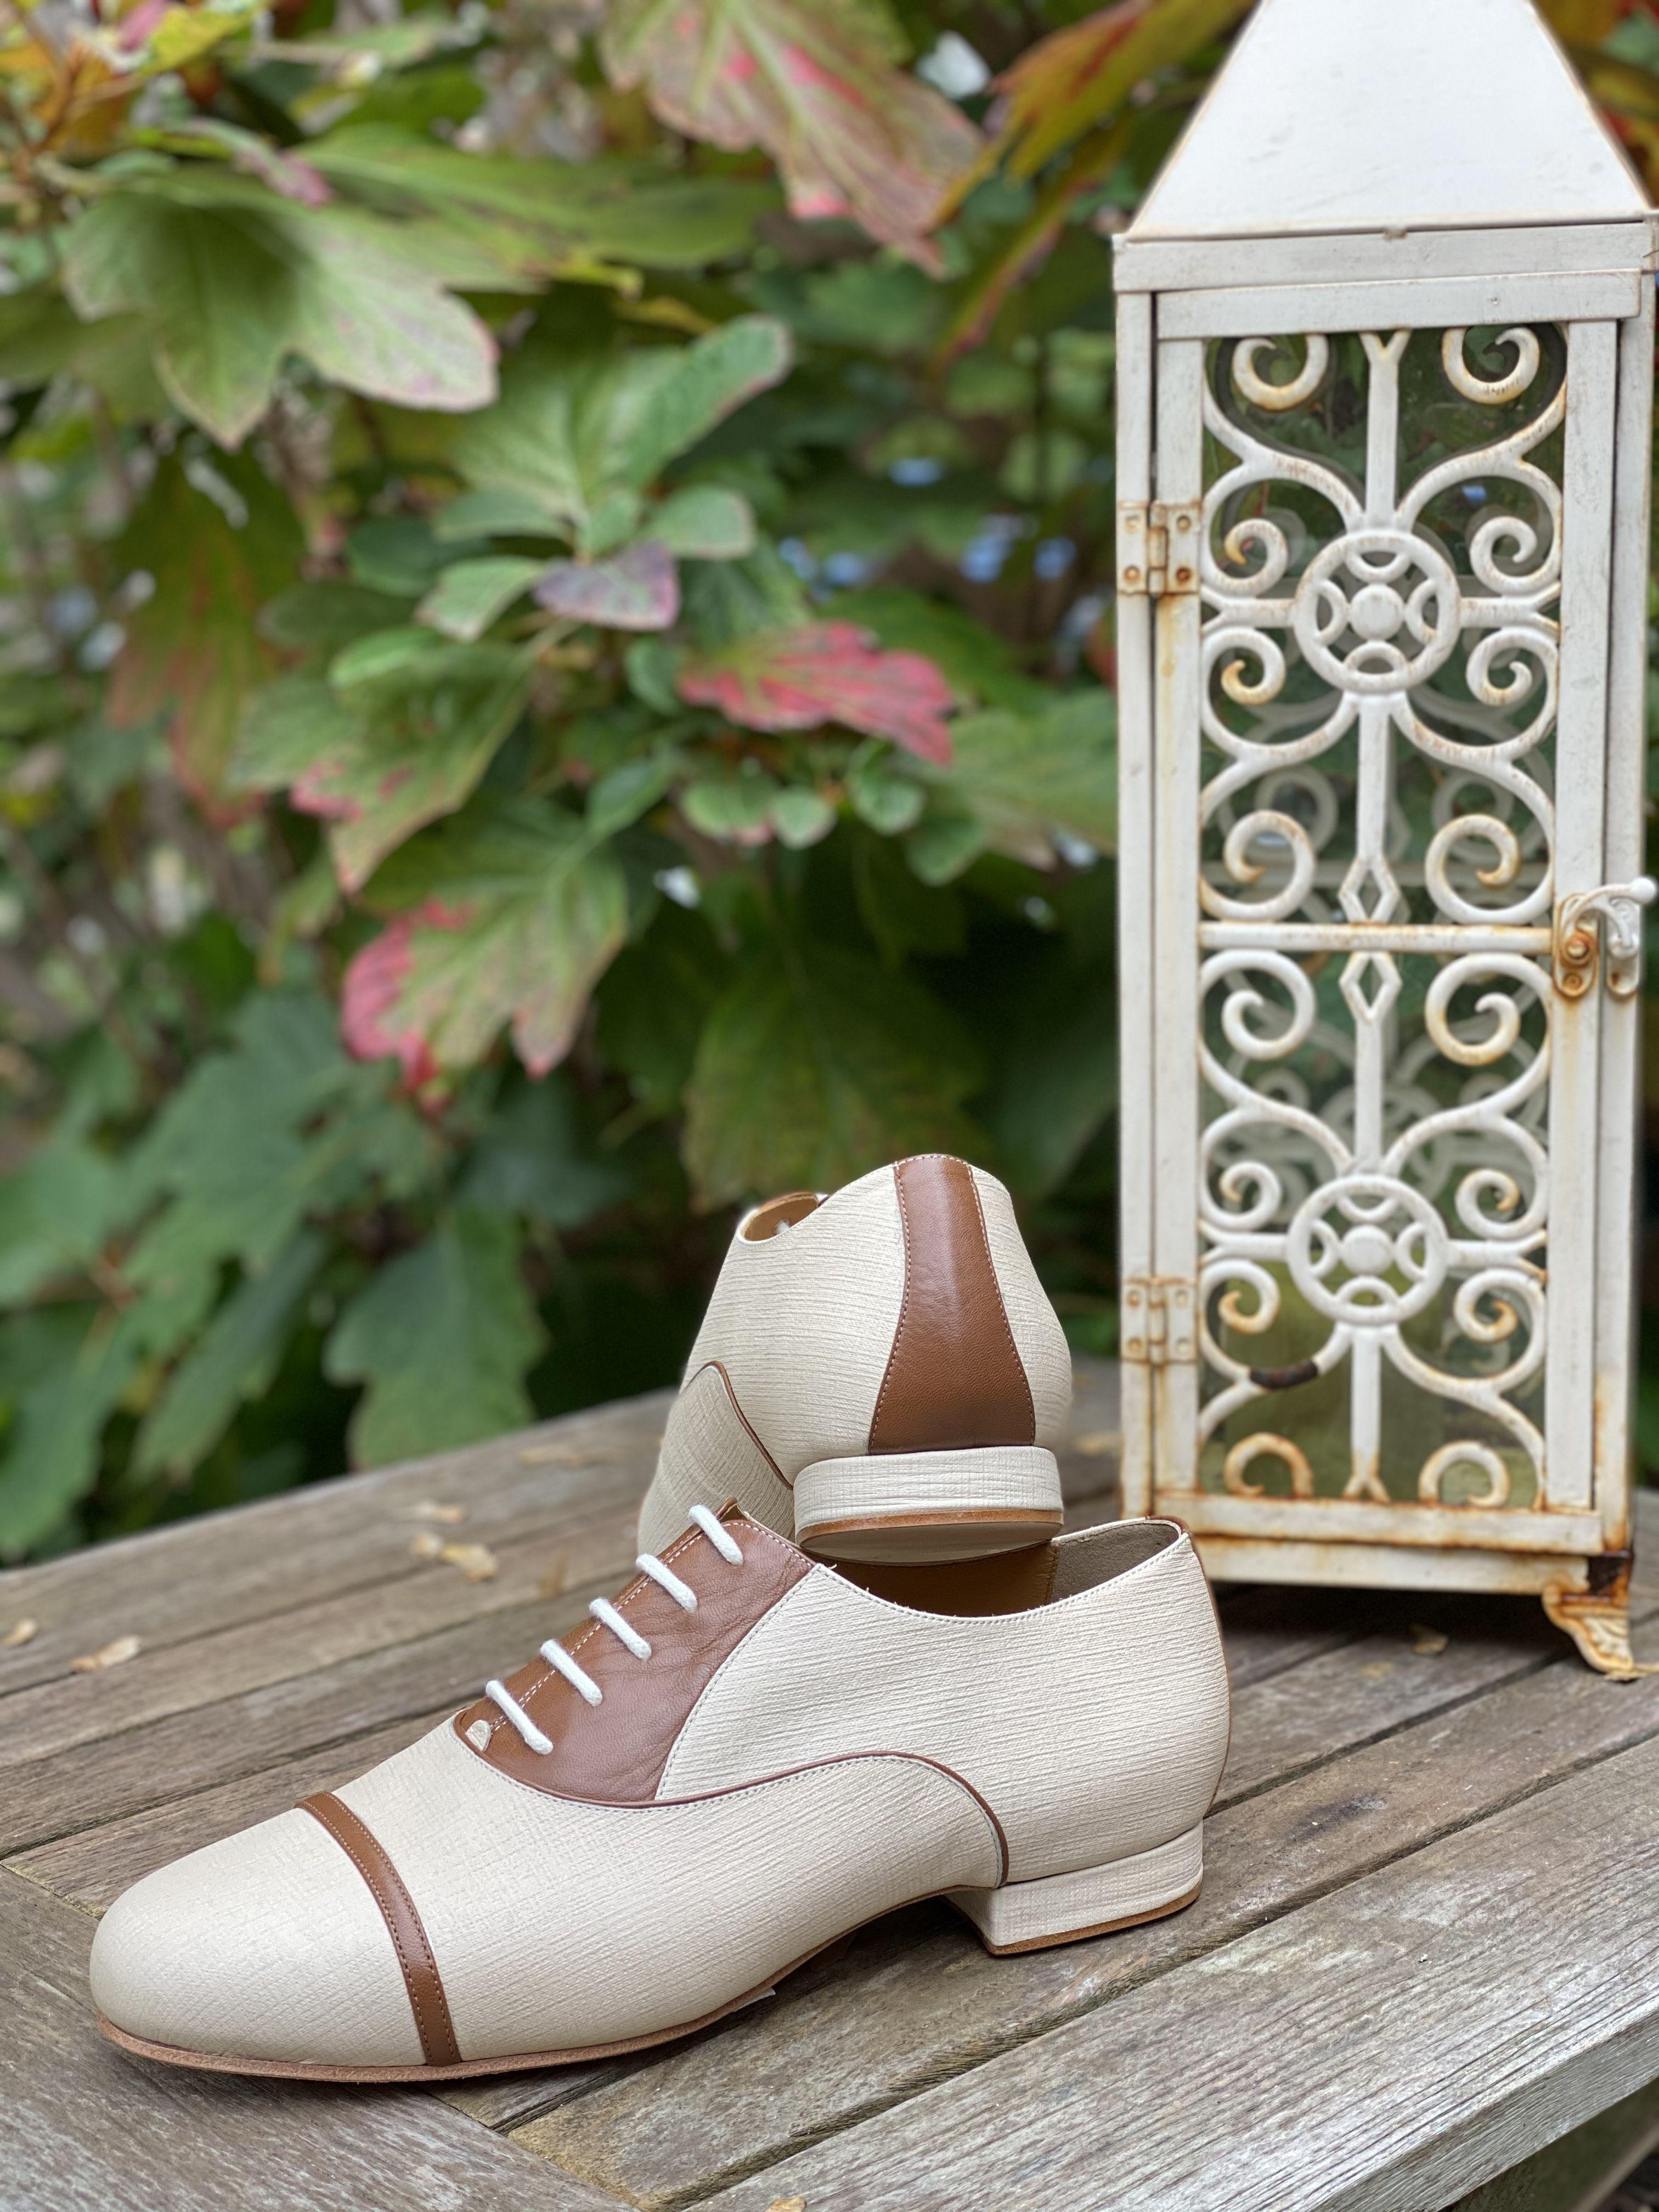 Schuhe Für Swing Tango Schuhe Tanzschuhe Vegane Schuhe